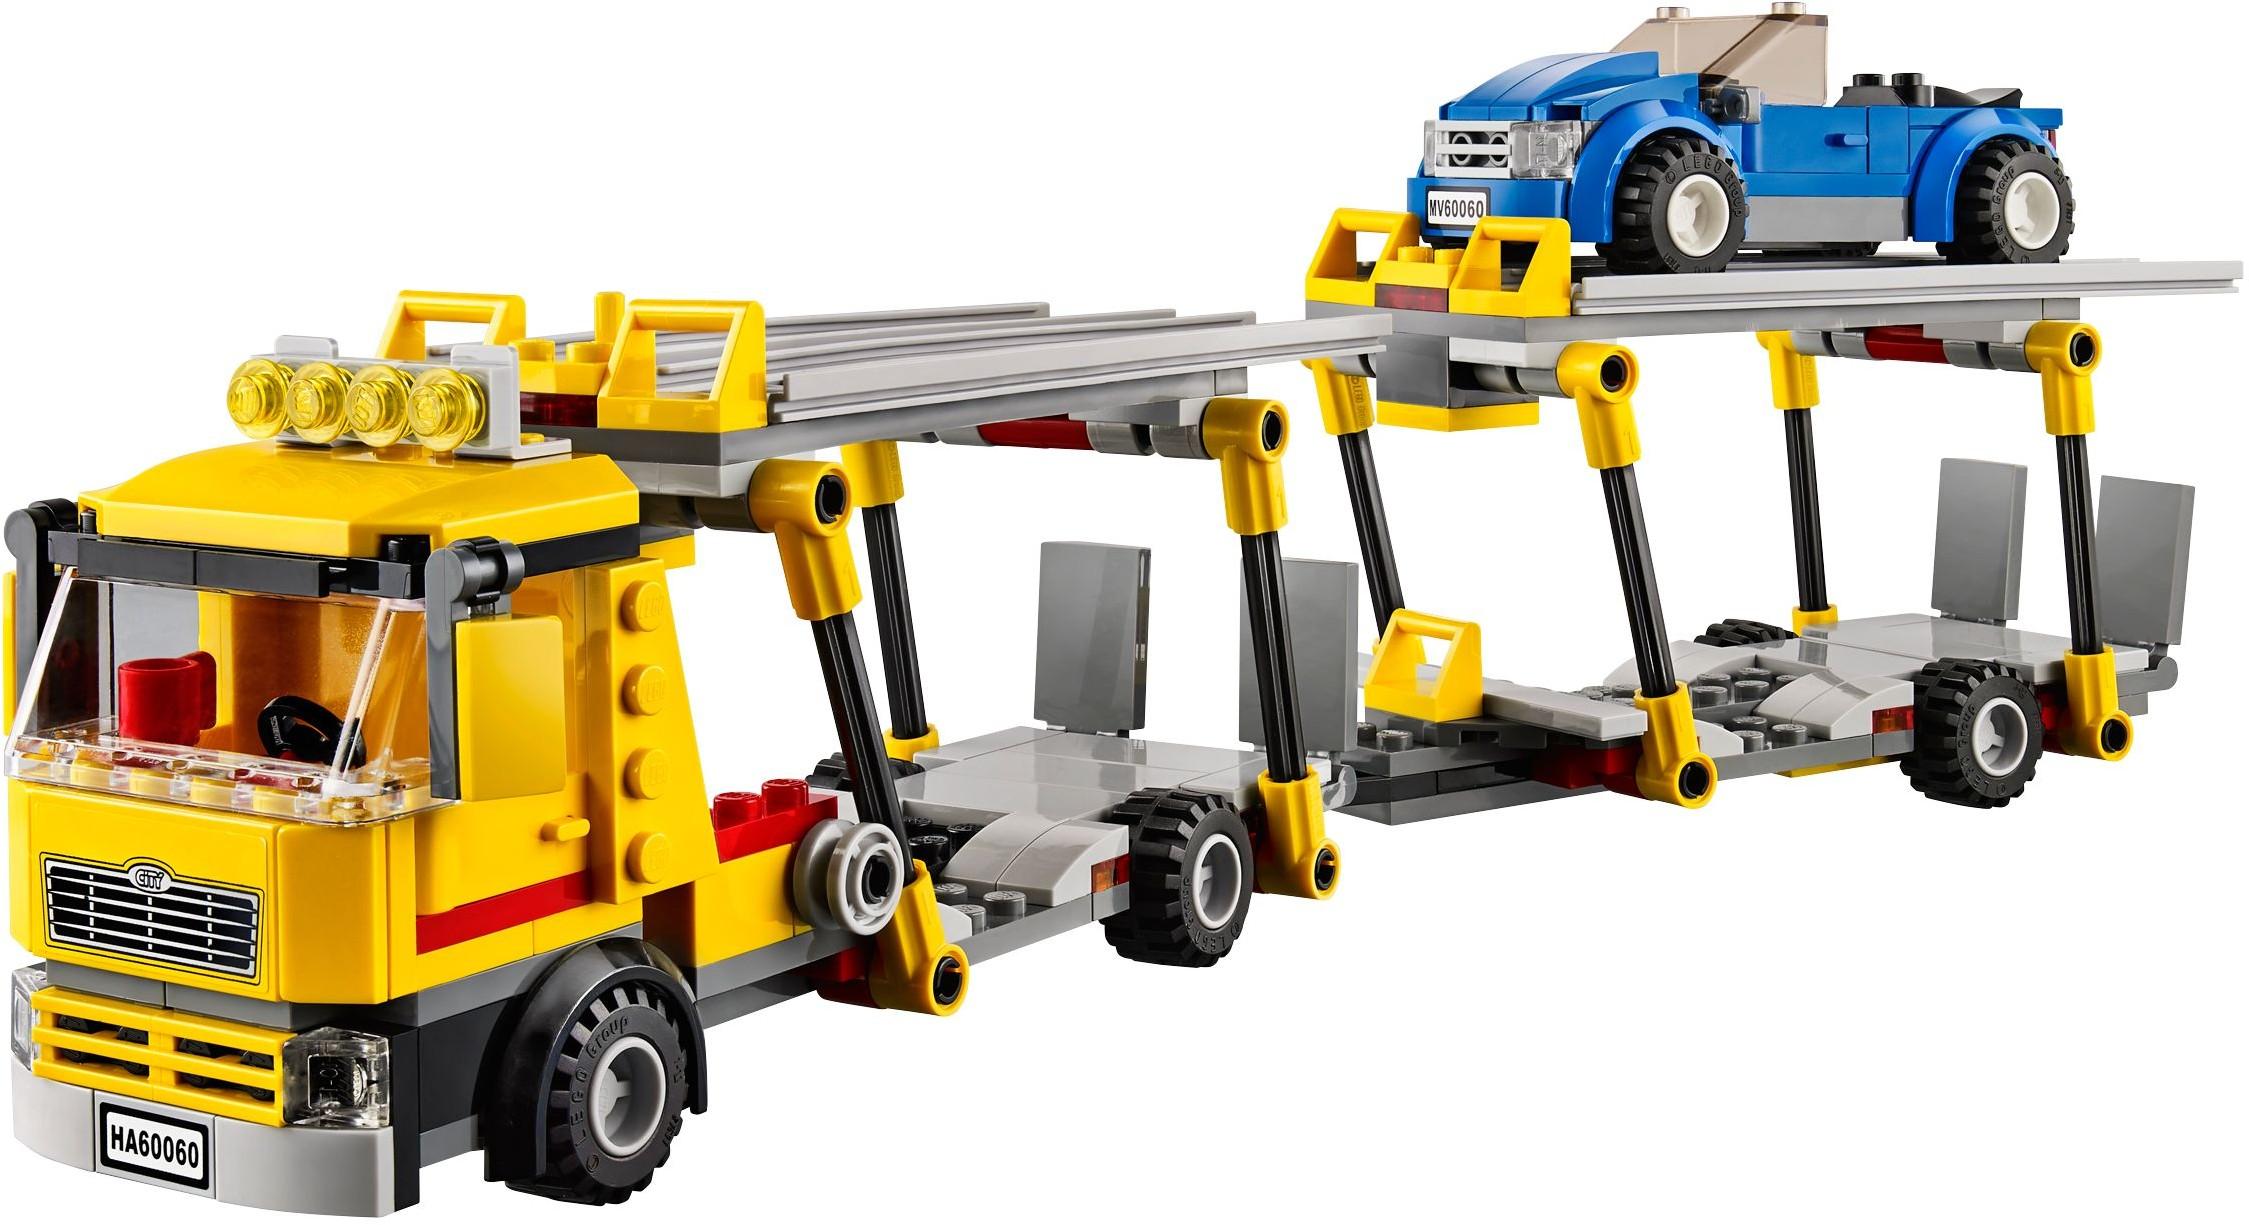 lego city auto transporter 60060 instructions